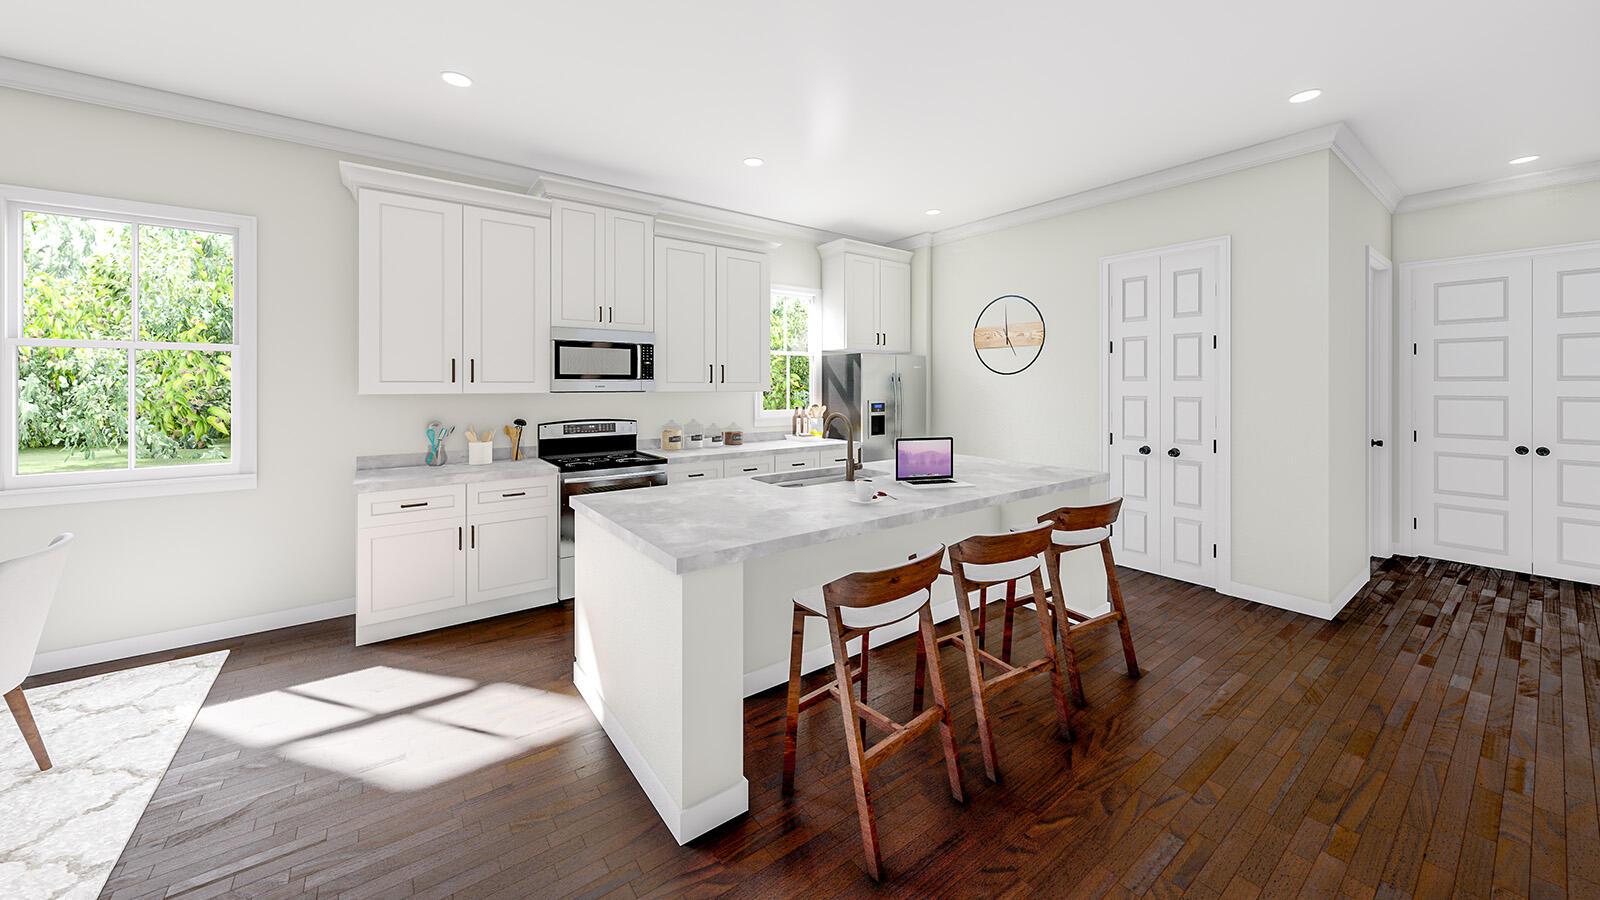 Carolina Park Homes For Sale - 3499 Habernaria, Mount Pleasant, SC - 15